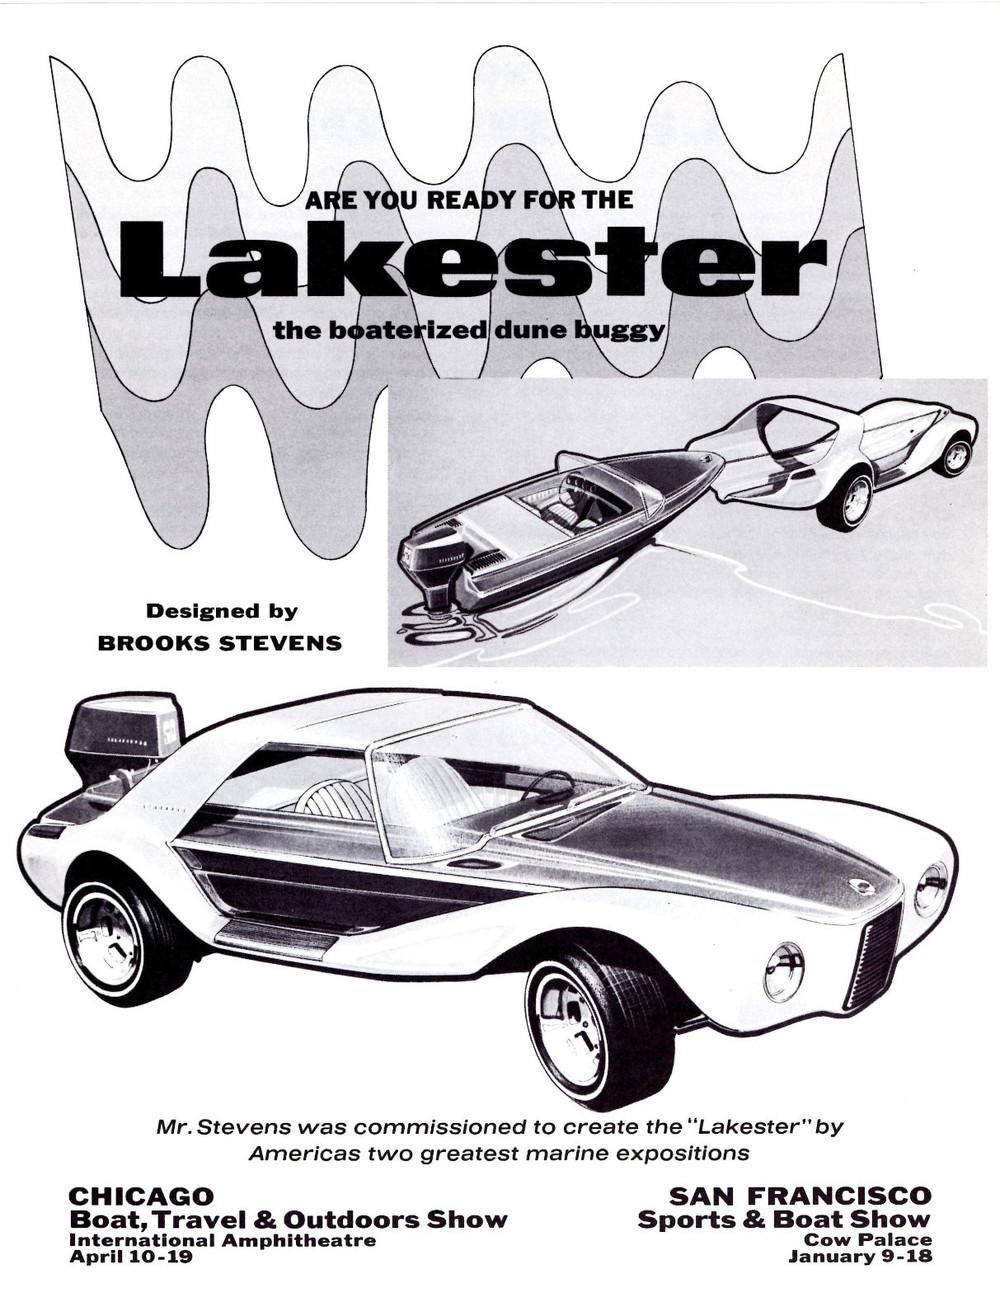 Brooks Stevens Evinrude Lakester show car ad